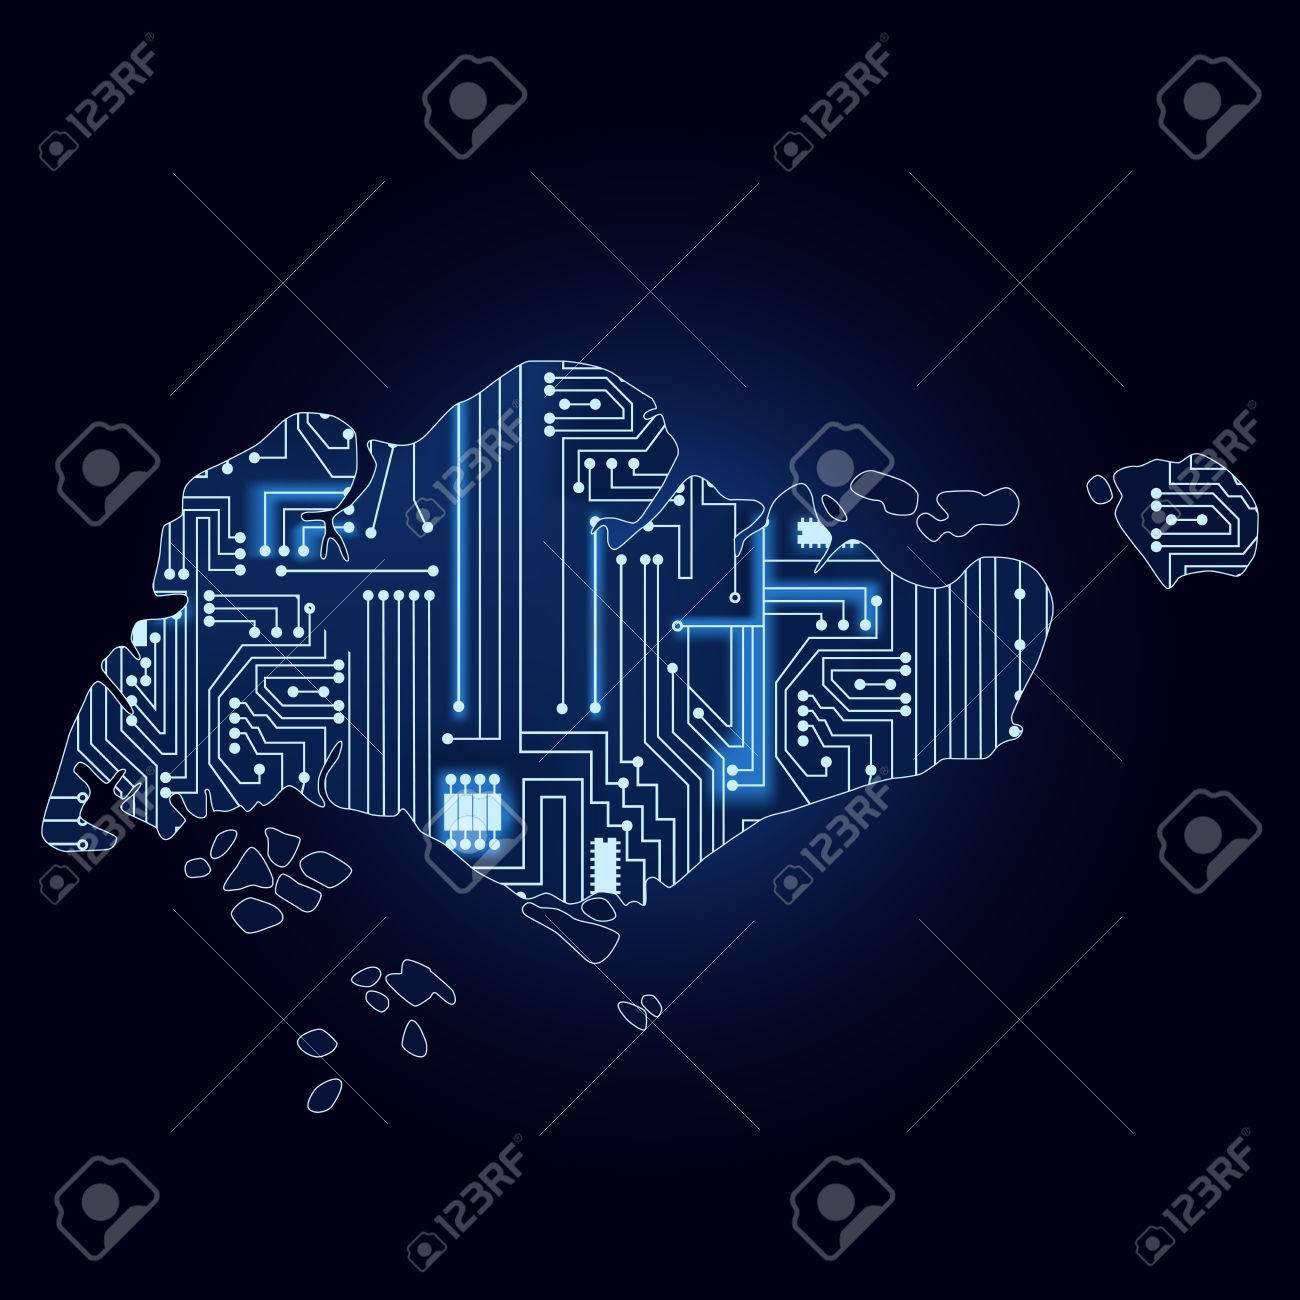 Circuito Singapur : Correspondencia de contorno de singapur con un circuito electrónico